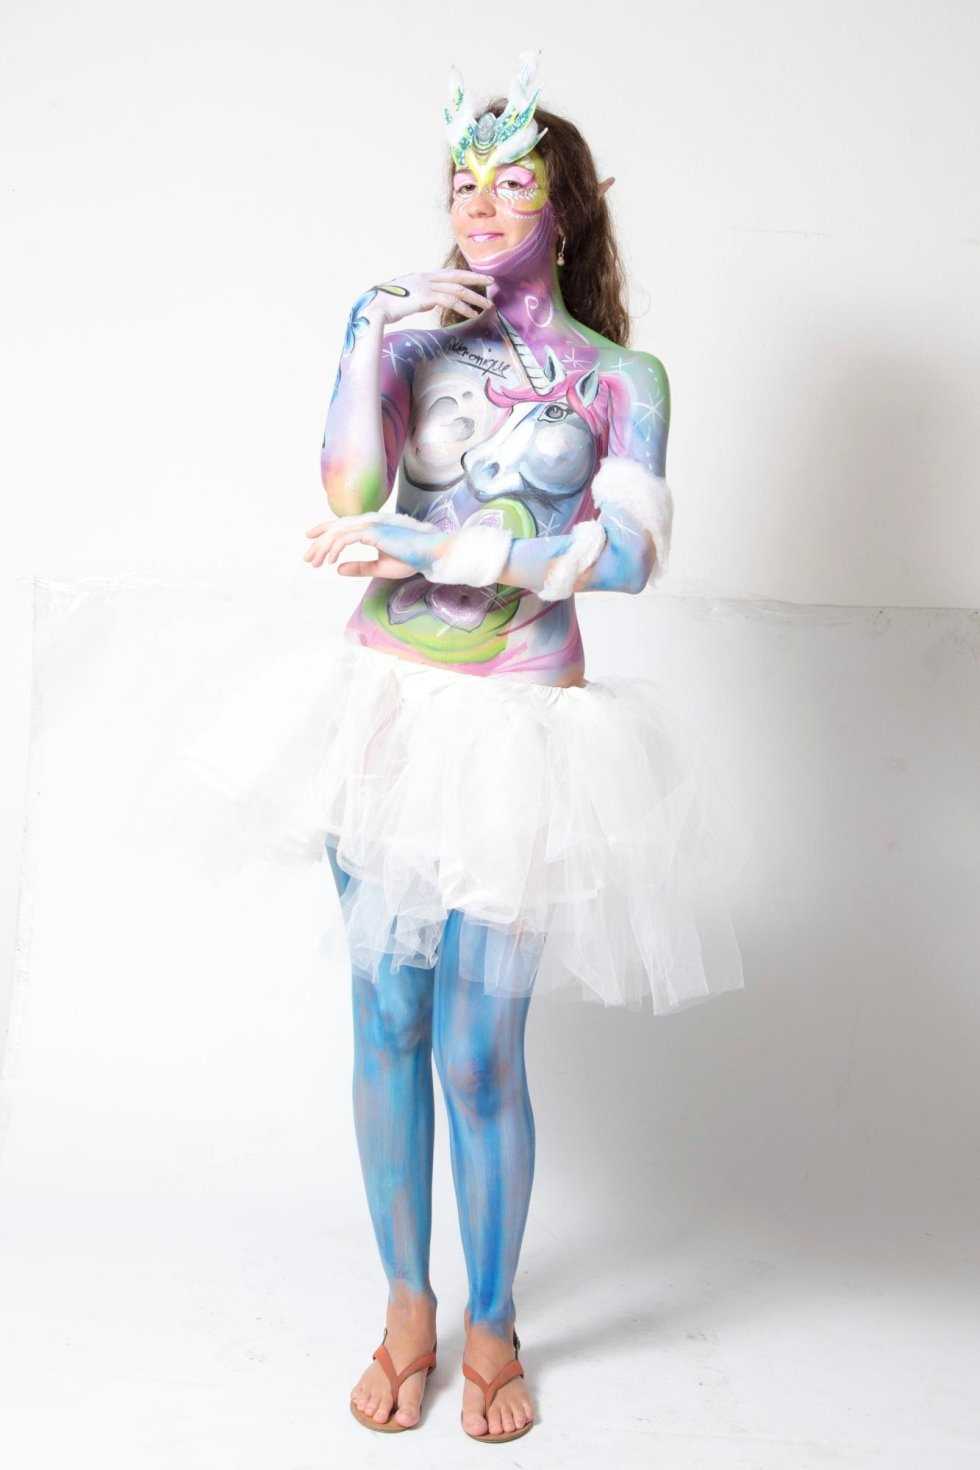 Modella con body painting